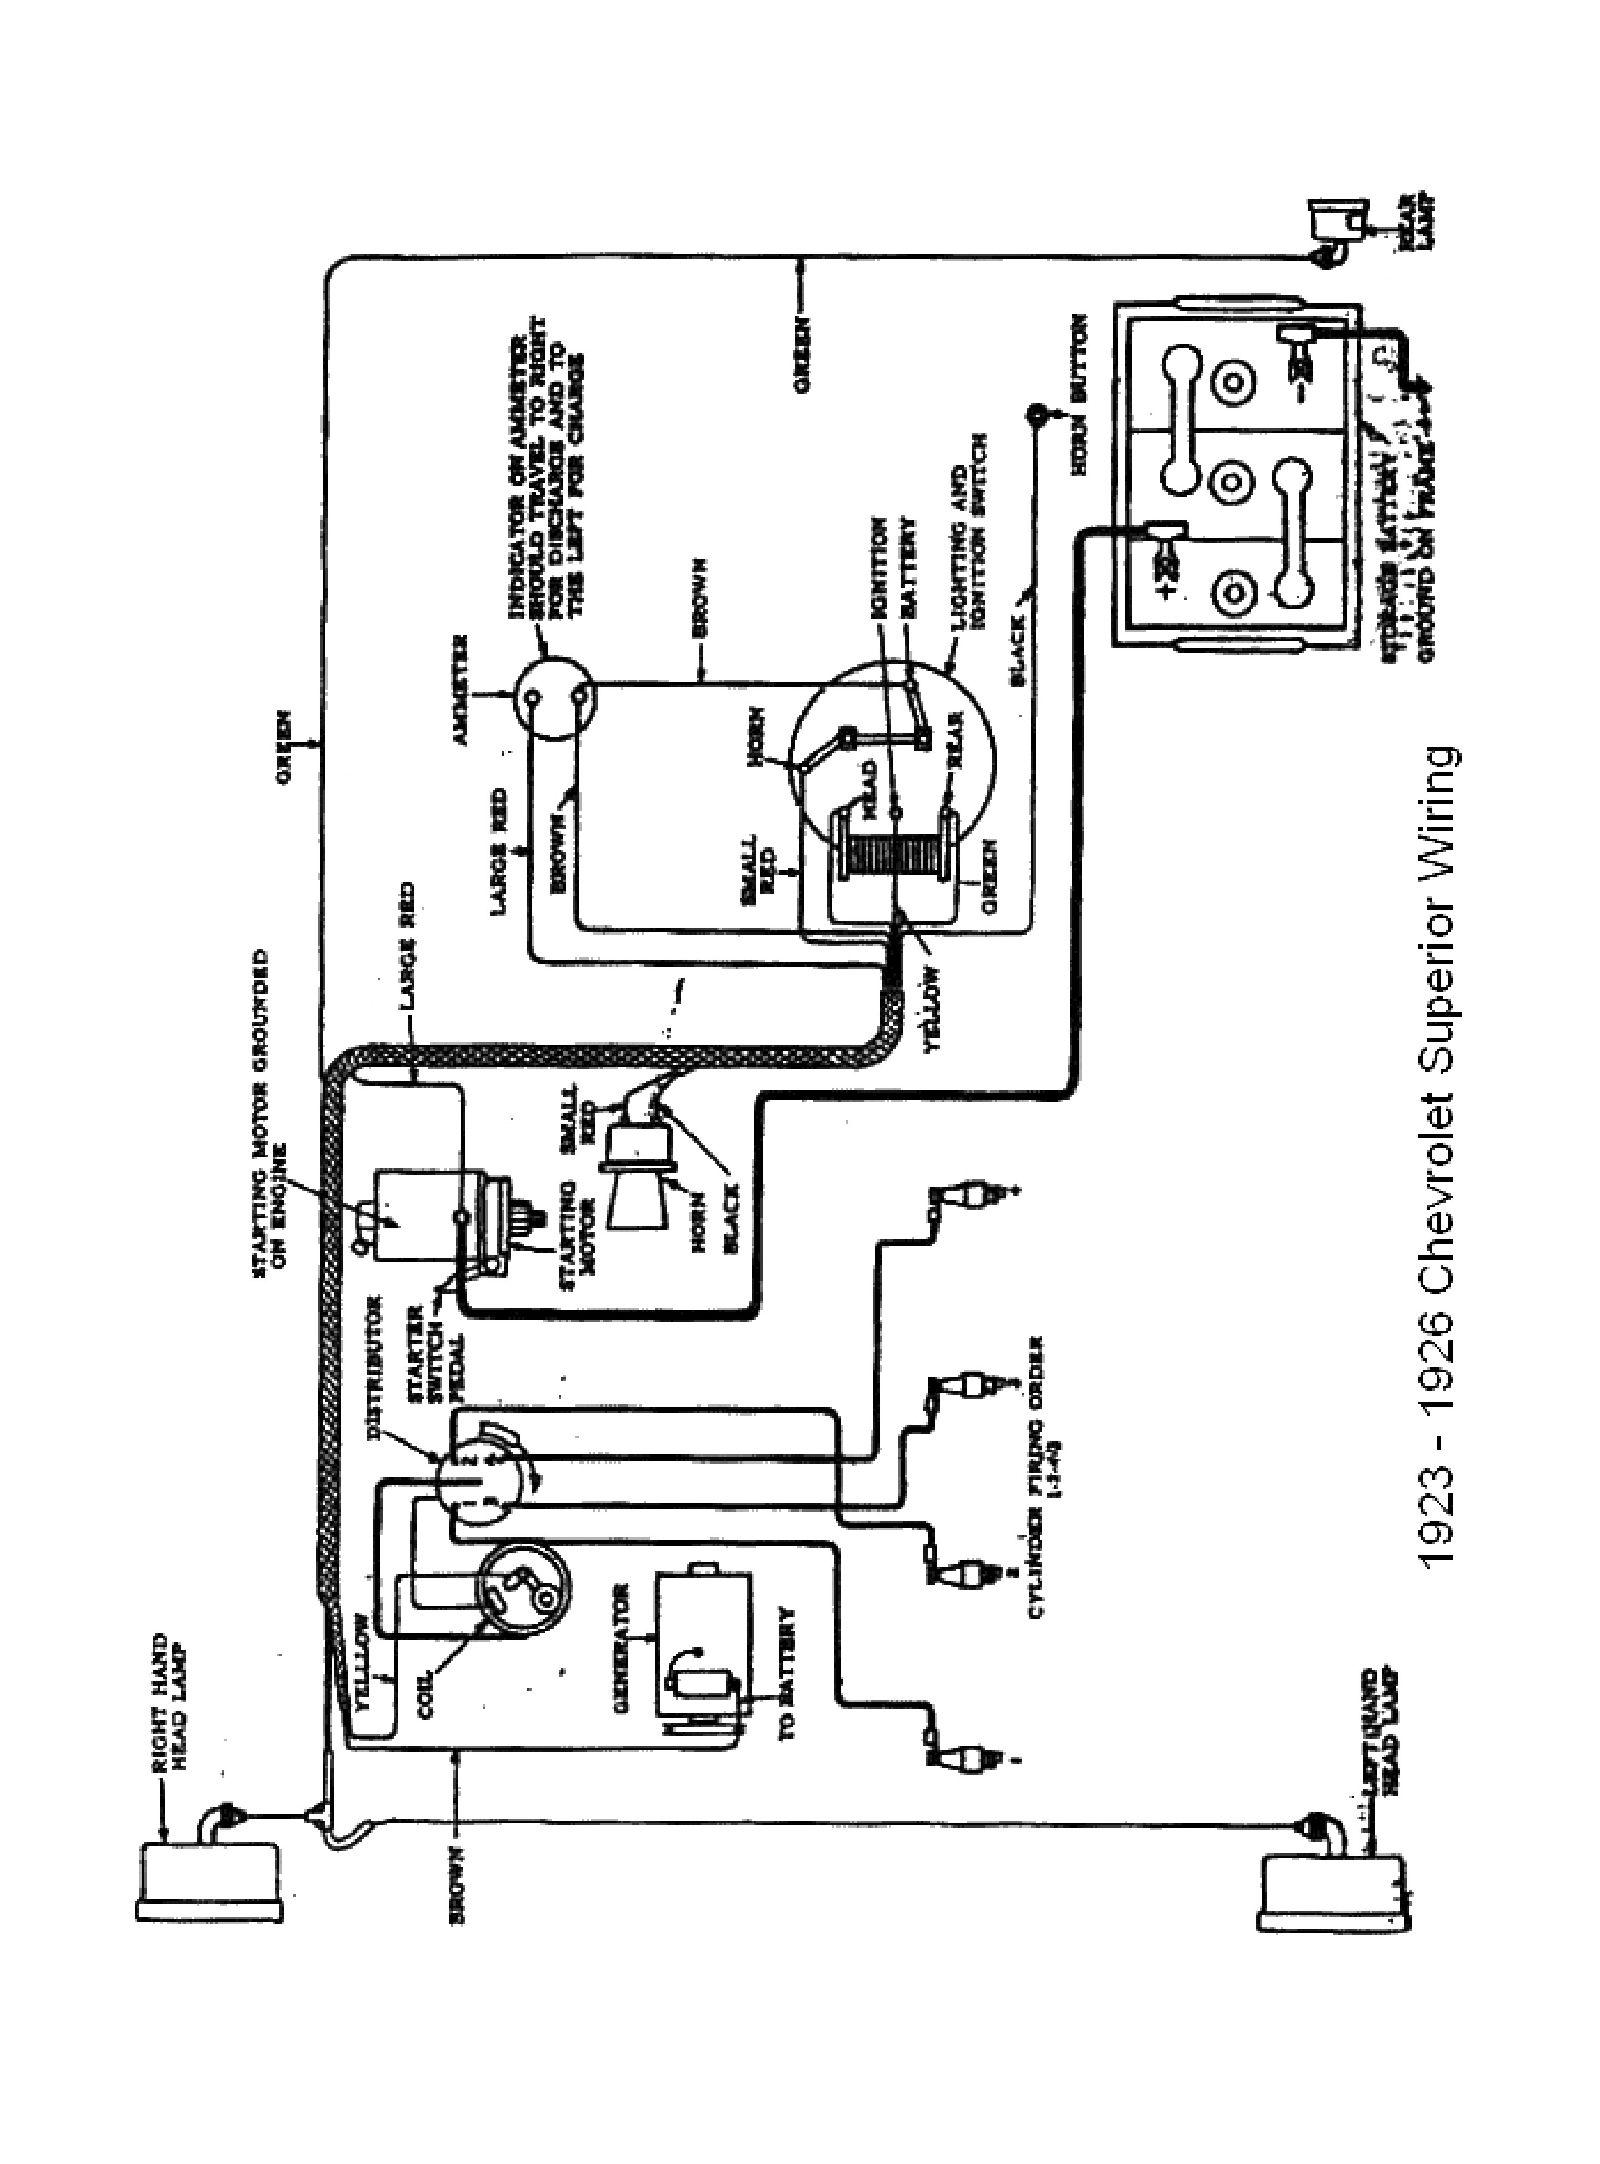 hight resolution of 1923 superior model 1923 superior model